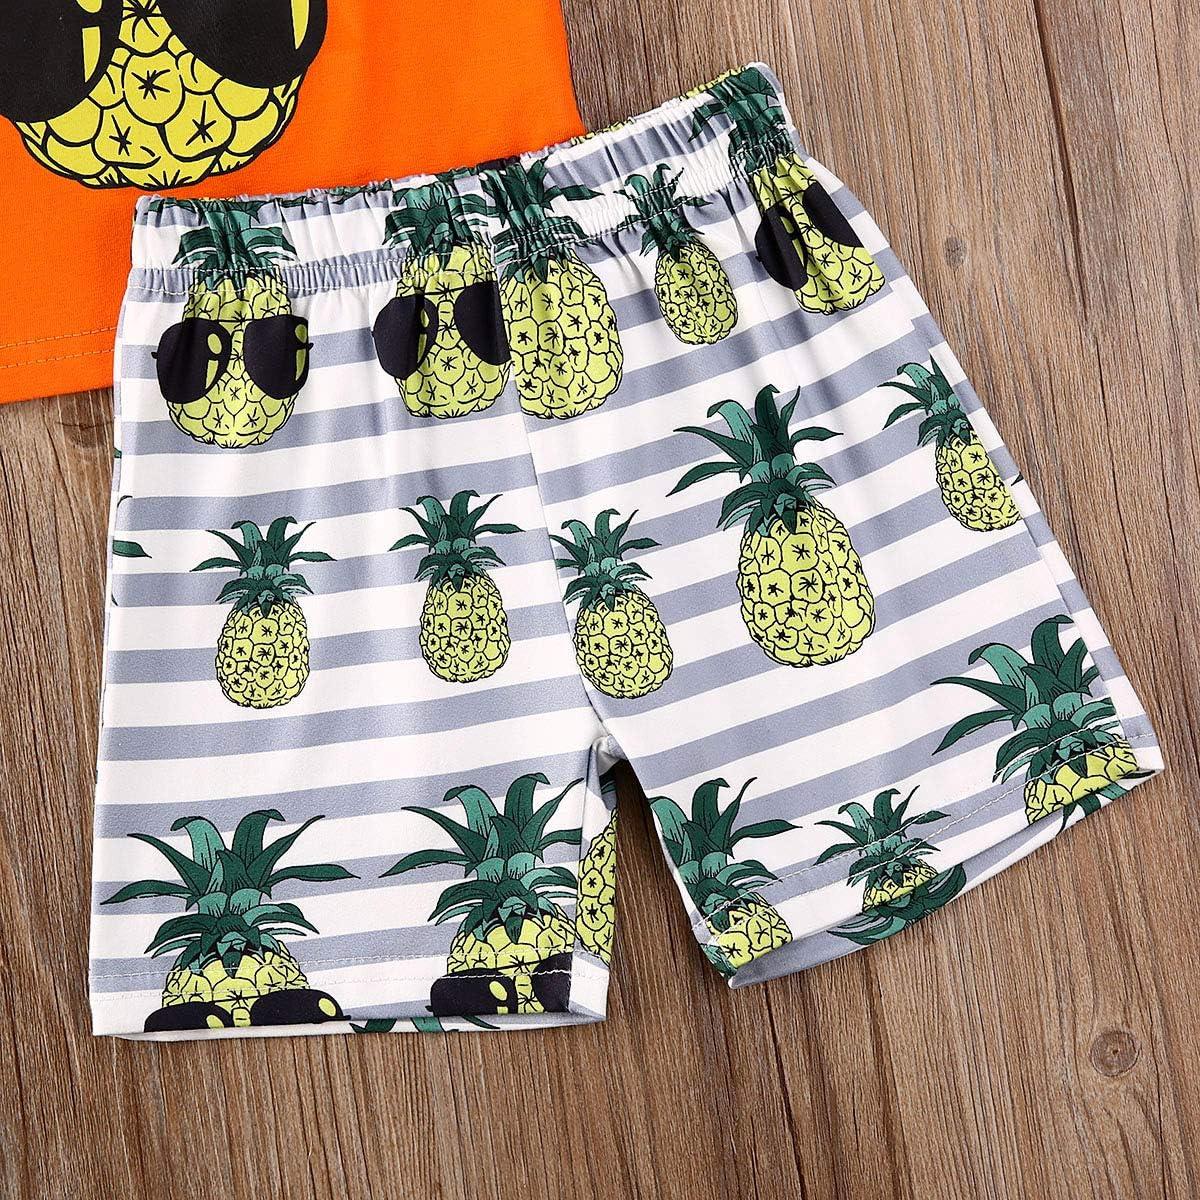 Fepege 2Pcs Newborn Baby Boy Summer Short Set Short Sleeve Pineapple Print T-Shirt Tops and Shorts Beach Clothes Outfits